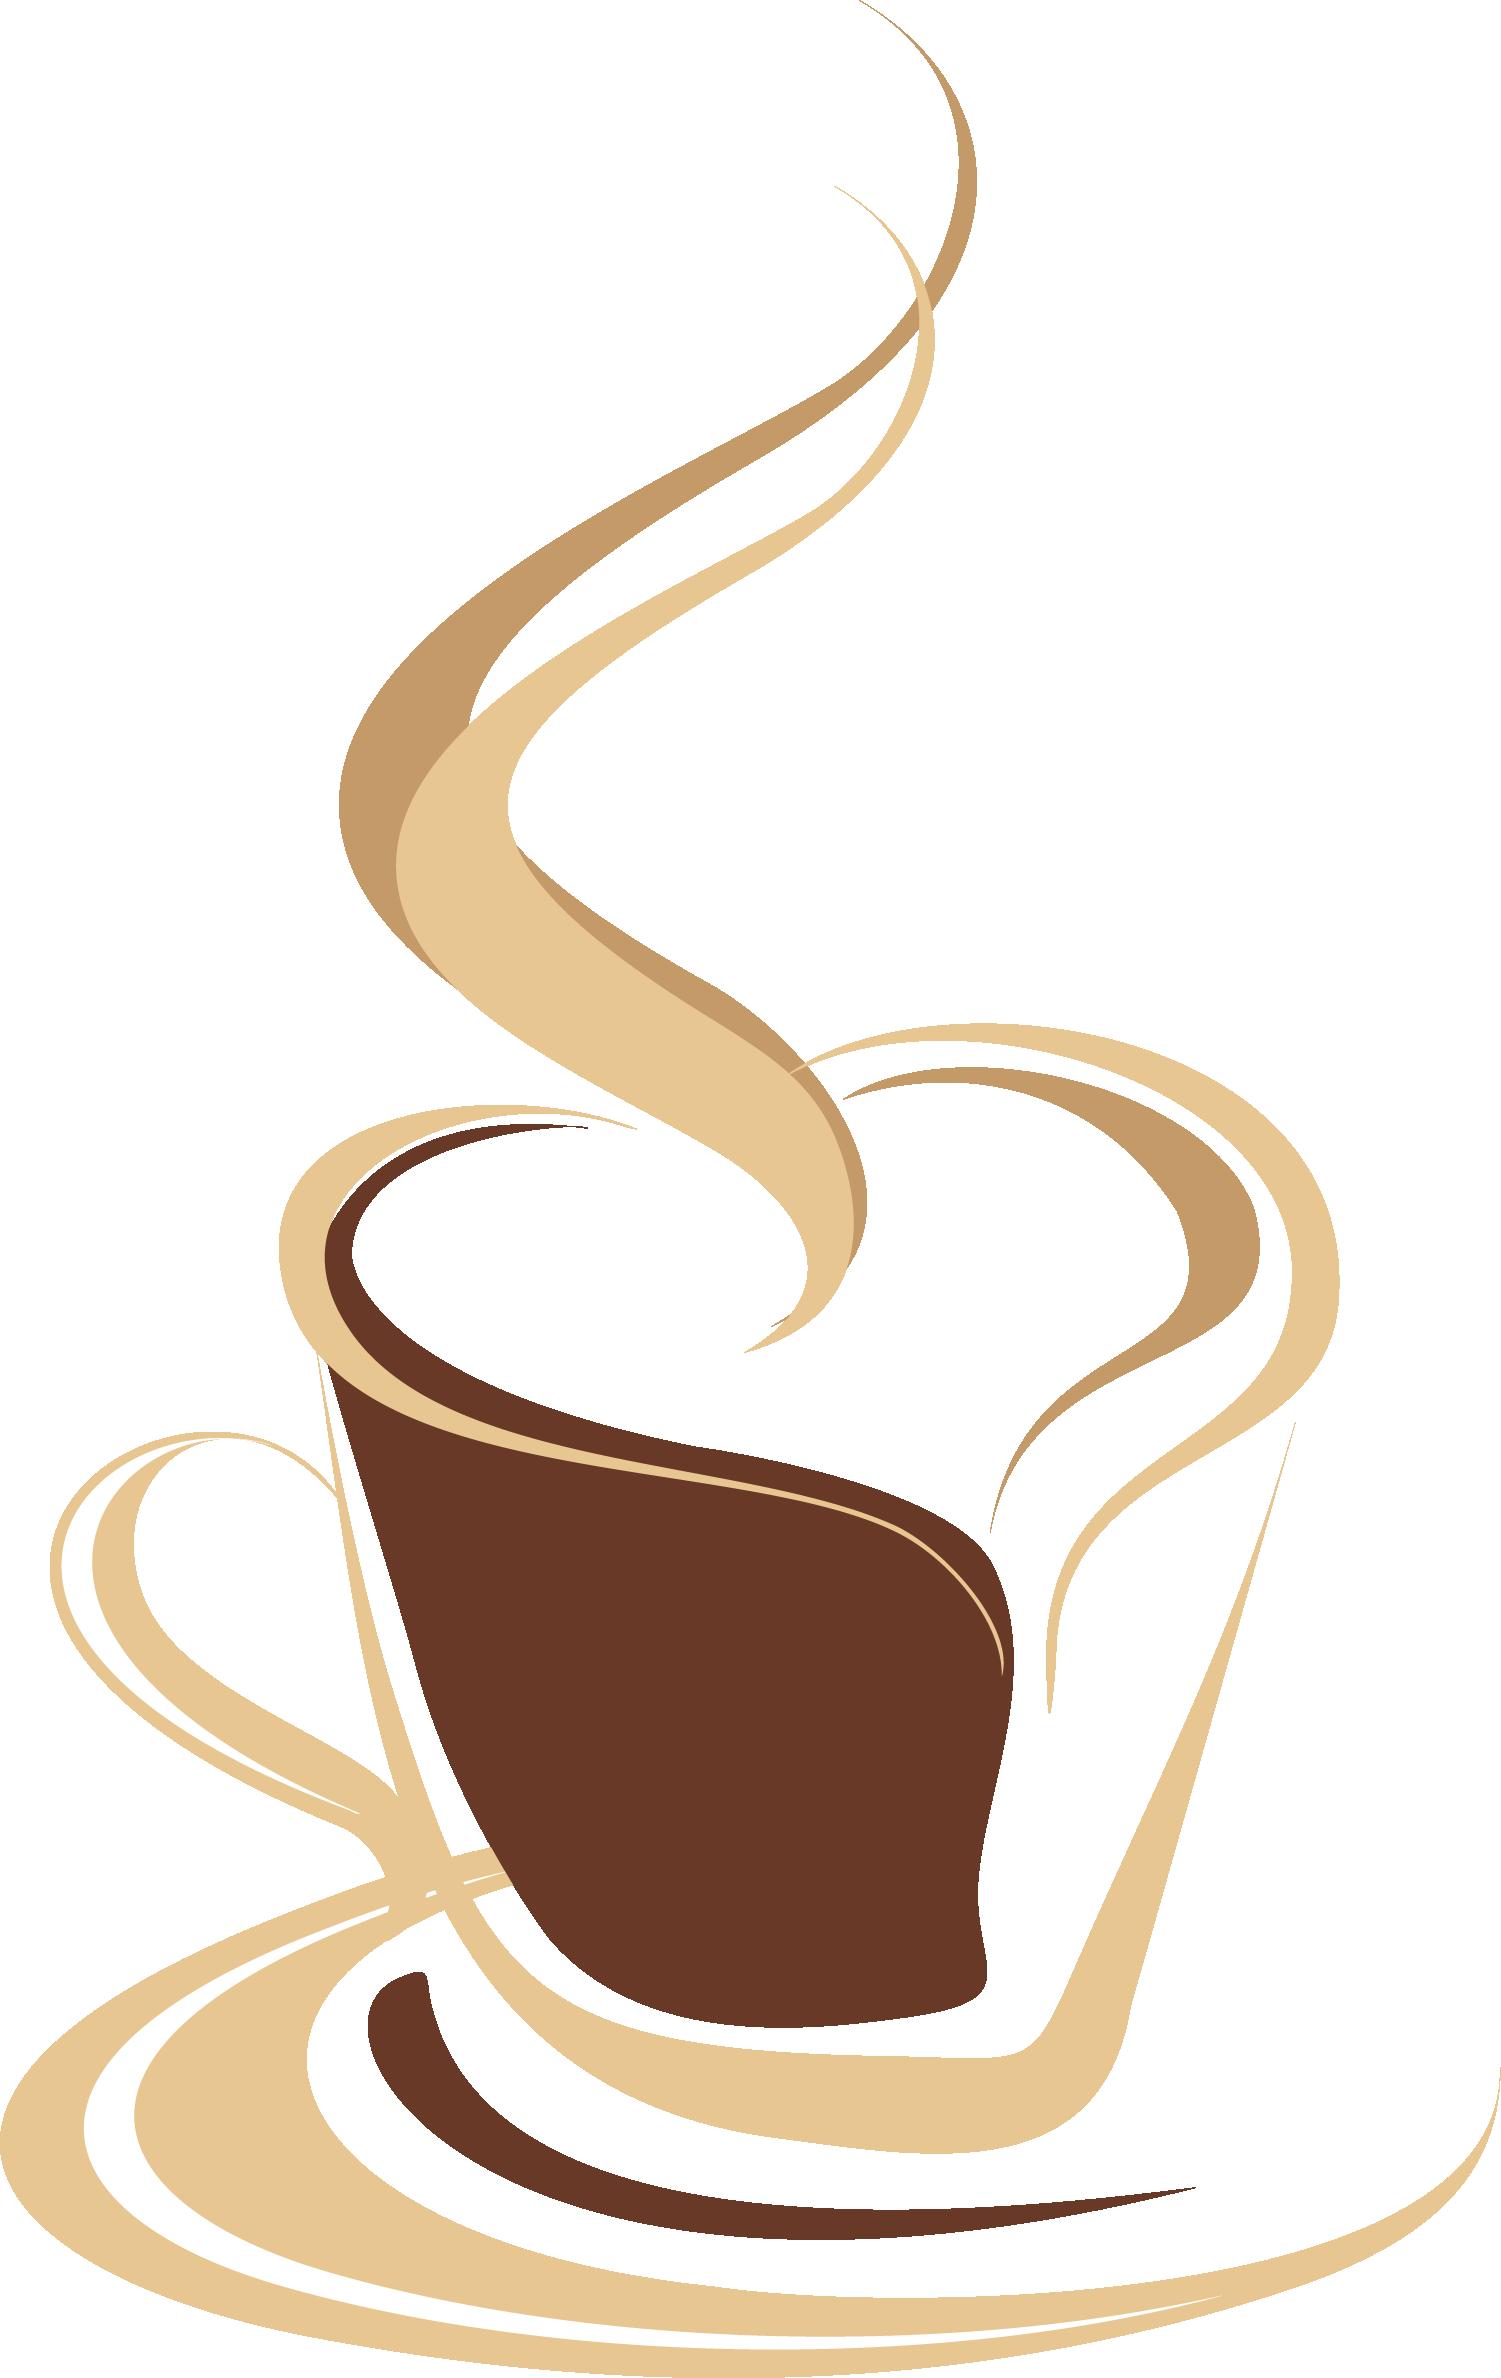 Coffee cup tea cafe. Clipart milk mug